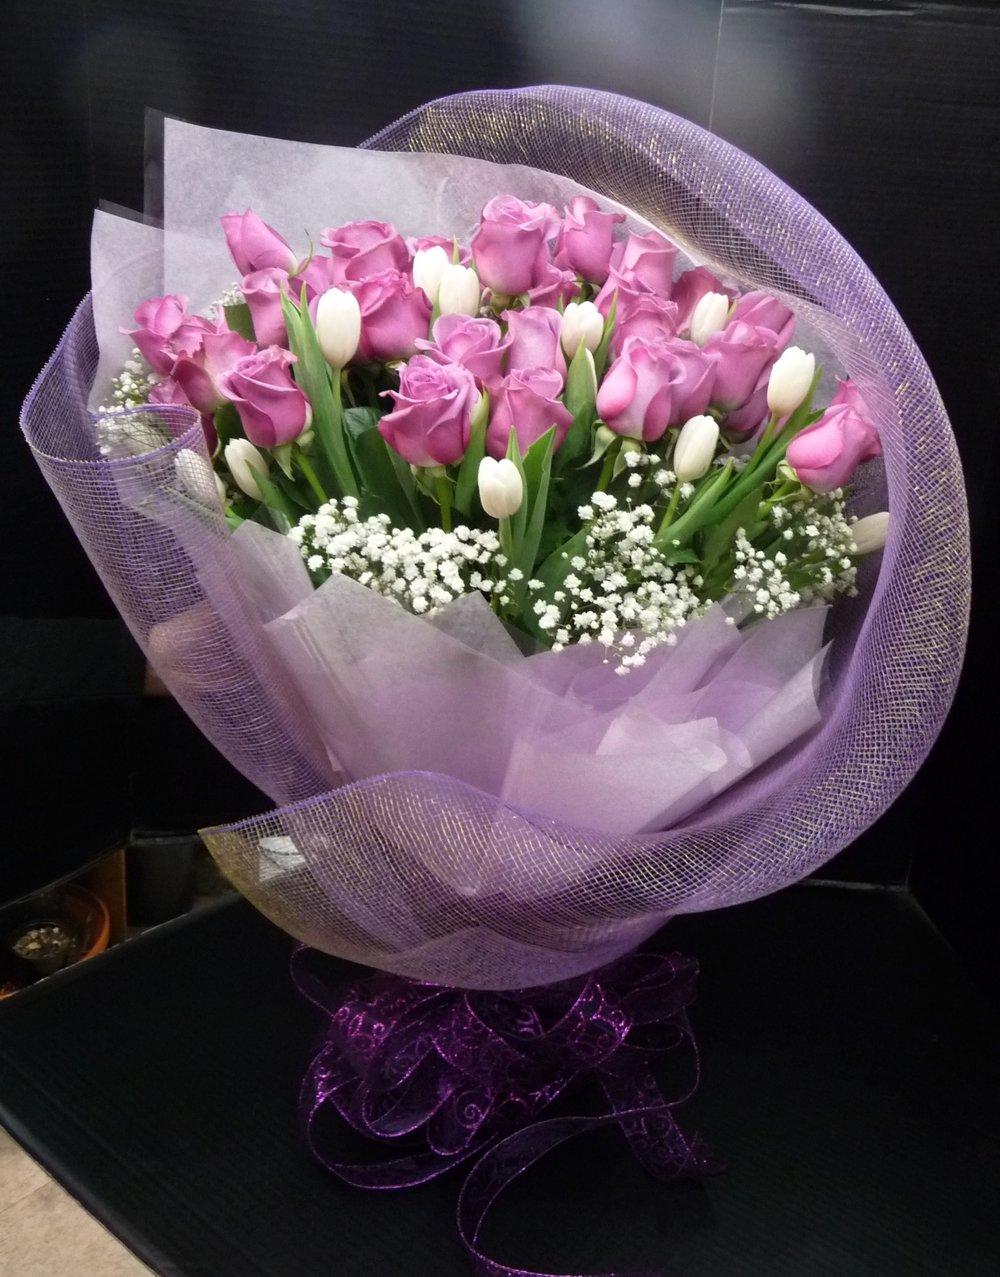 Tulips & Roses